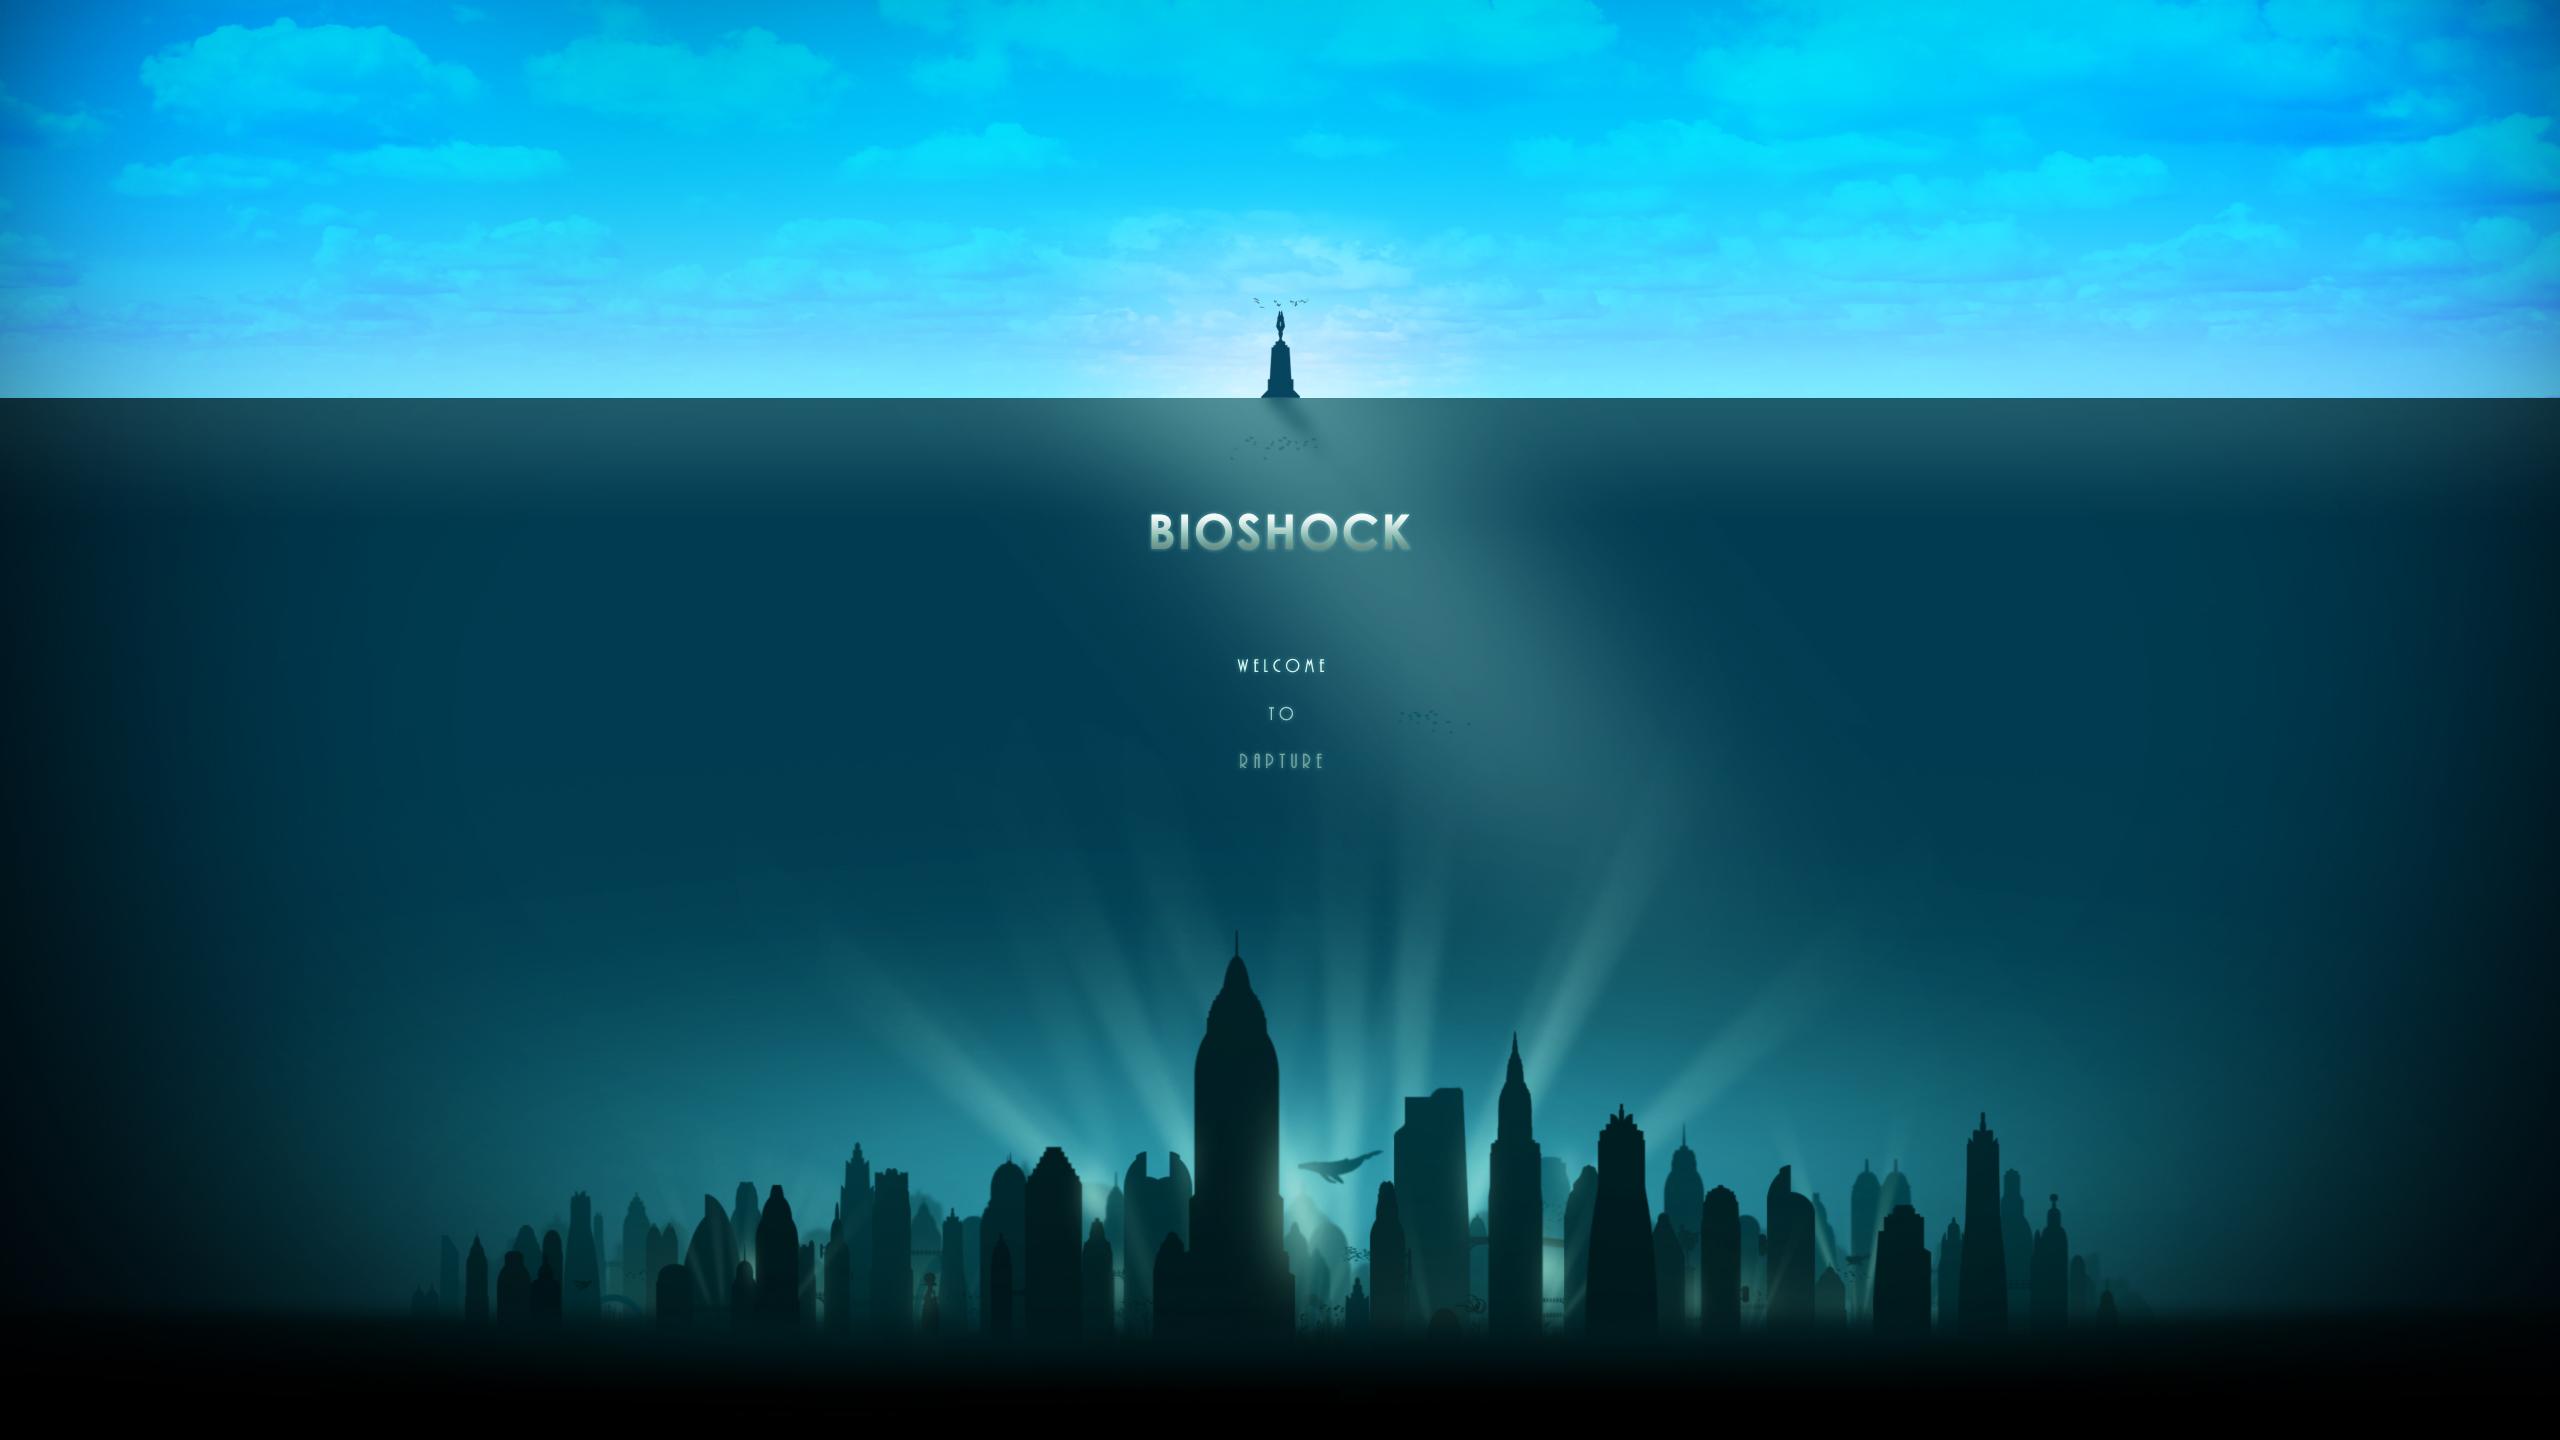 Bioshock Wallpaper 2560x1440 By Rocklou On Deviantart